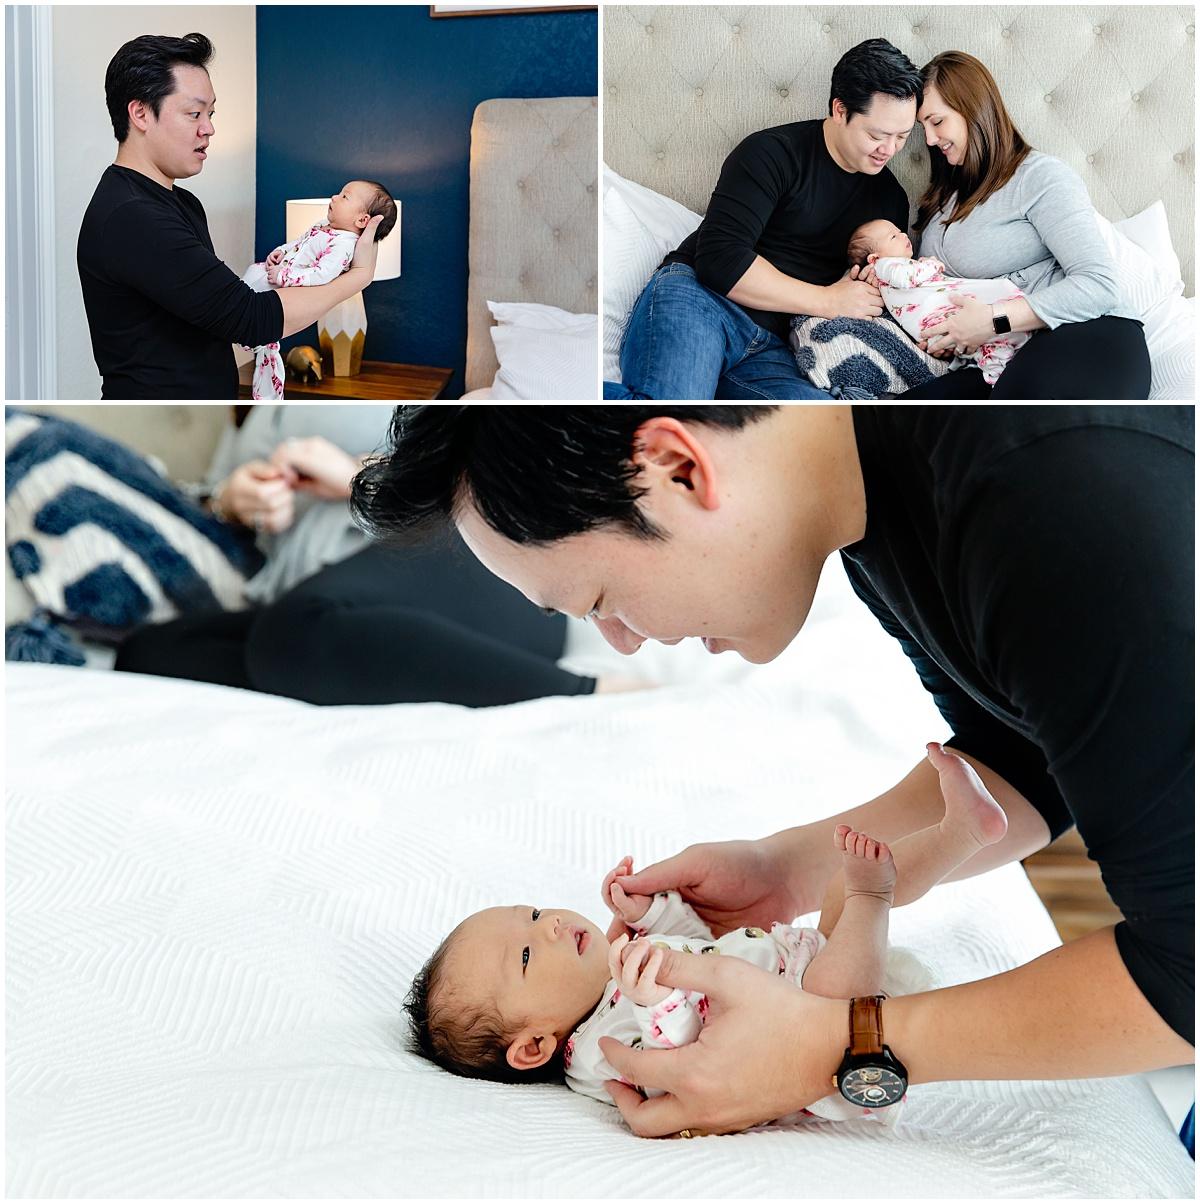 Lifestyle-newborn-family-photos-san-antonio-texas-carly-barton-photography_0002.jpg